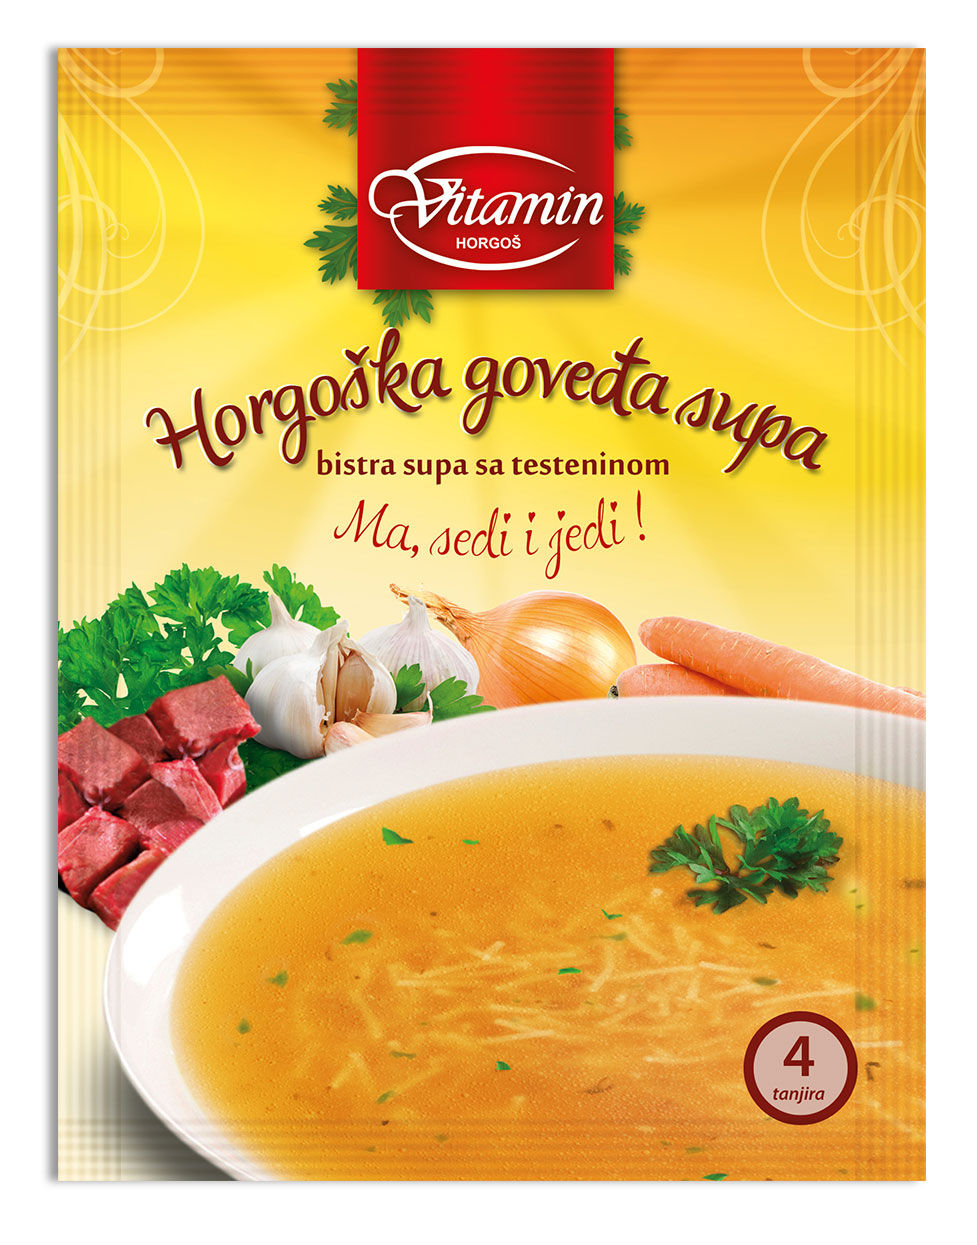 vitamin pakovanje 1